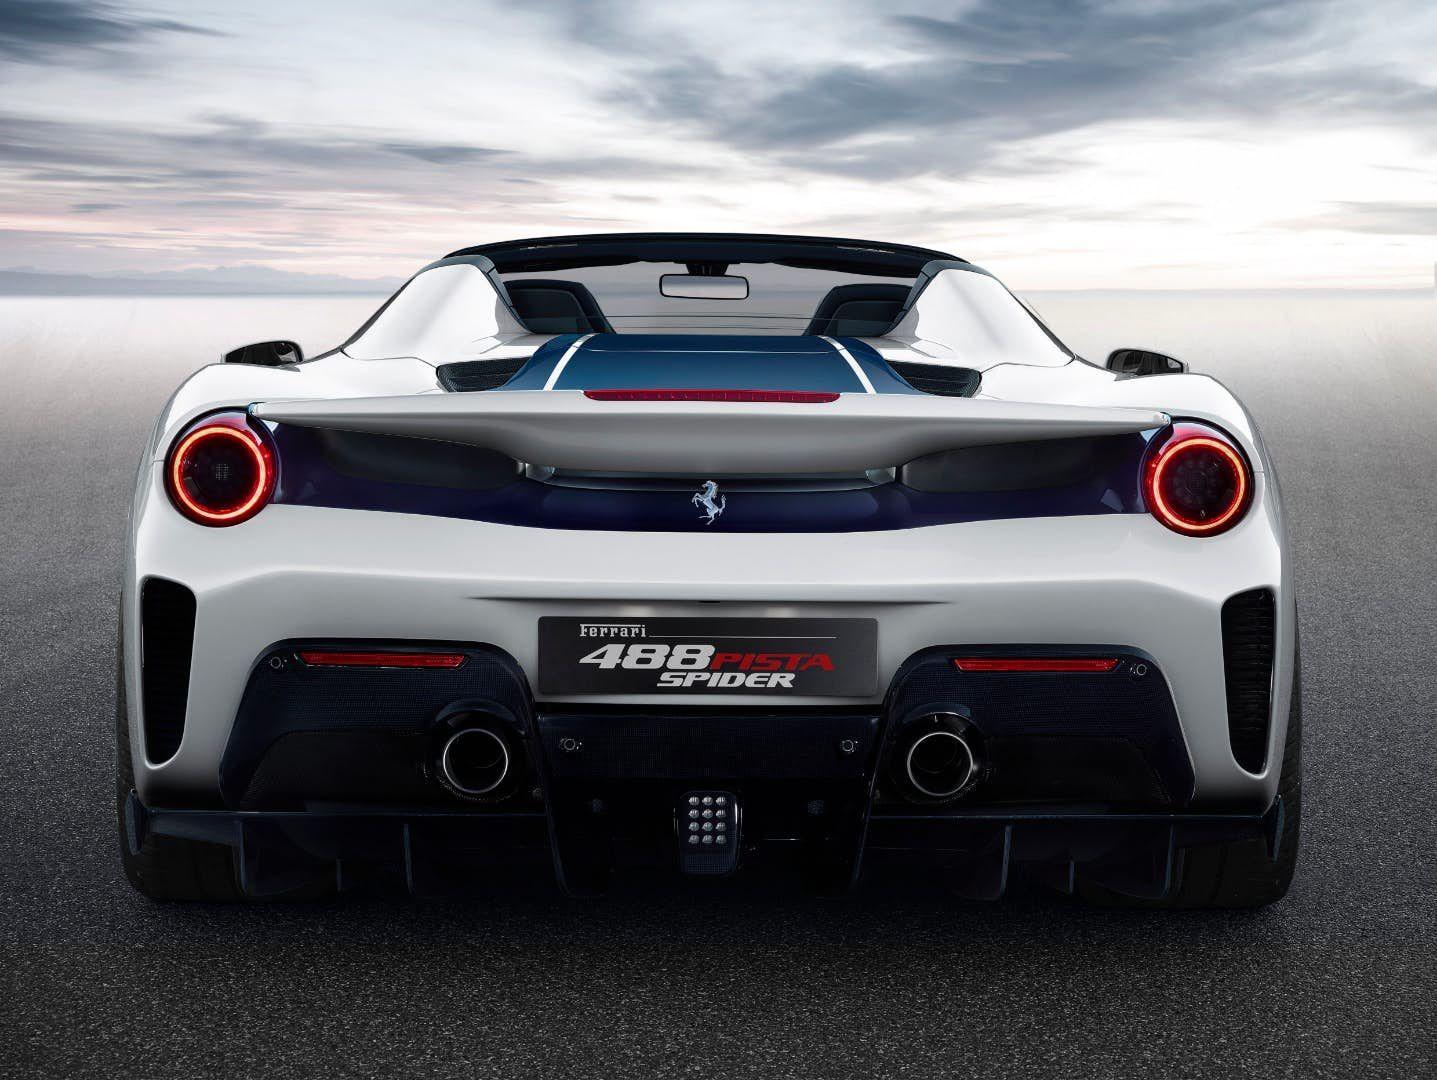 Ferrari Wheels Out Its Most Powerful Convertible Yet The 720 Hp 488 Pista Spider Ferrari Car Ferrari 488 Ferrari